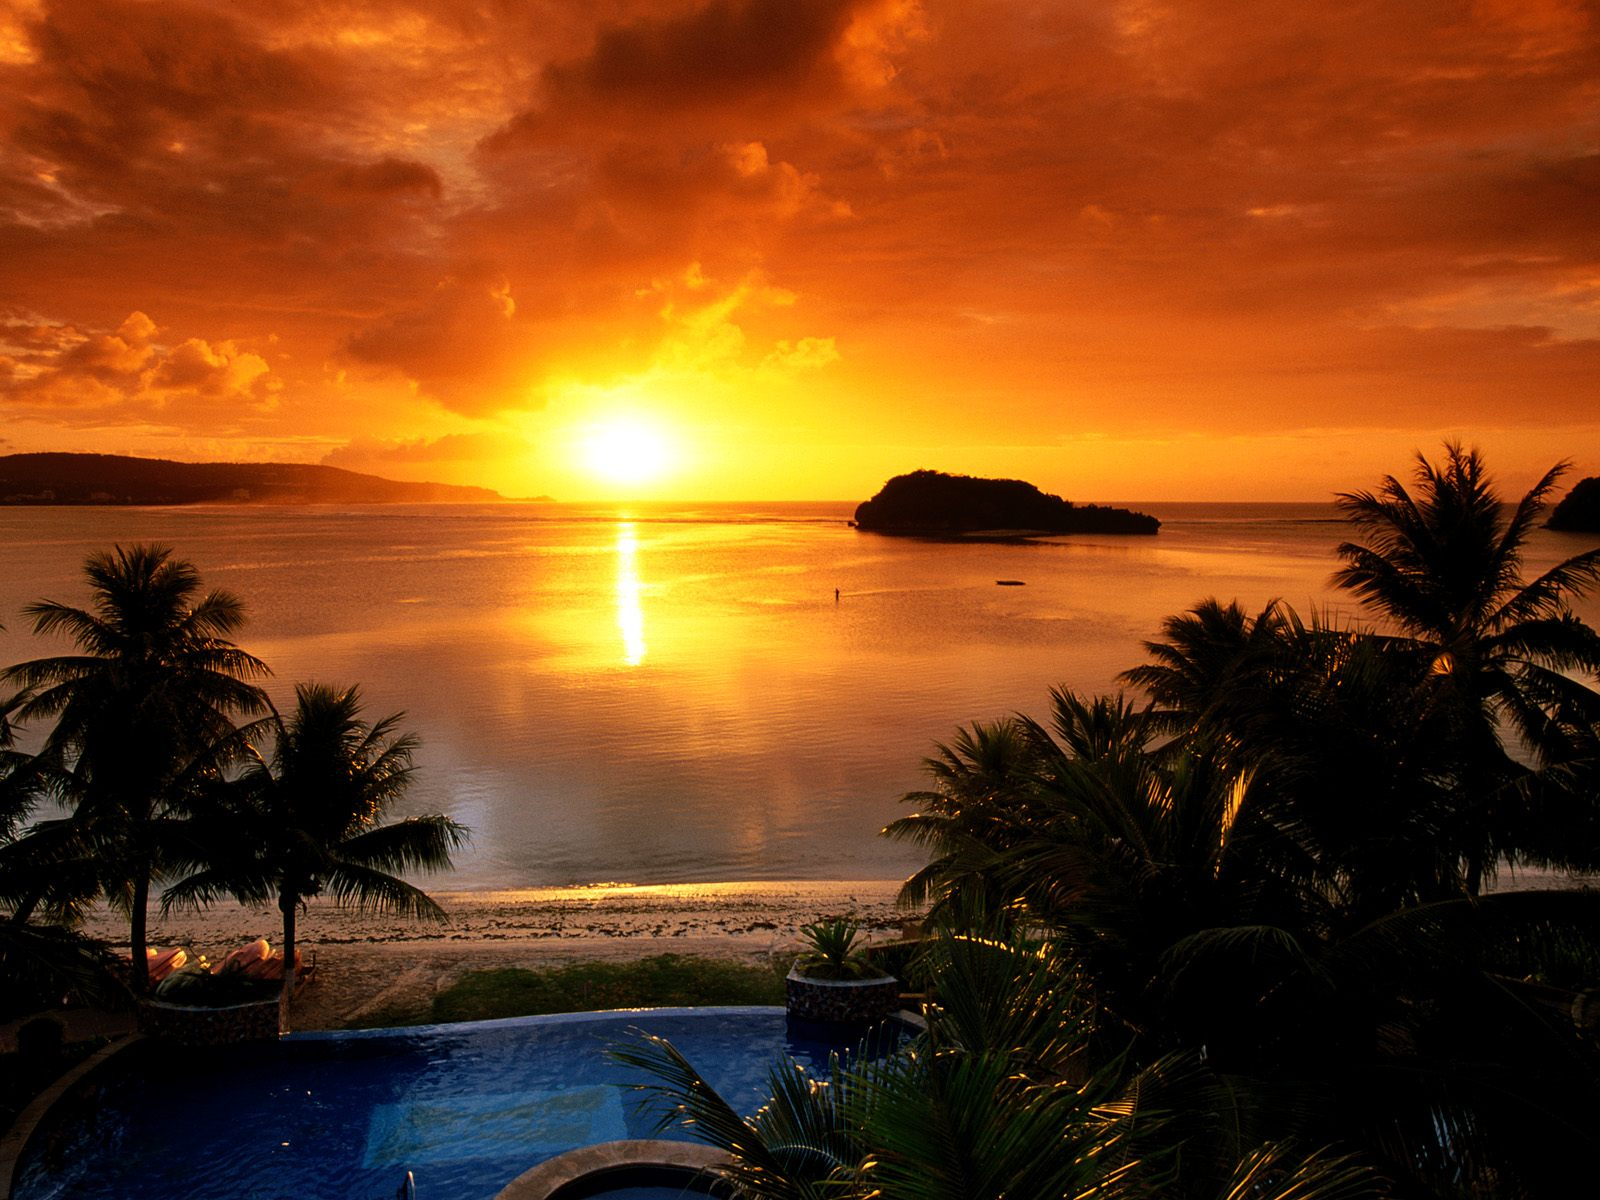 http://2.bp.blogspot.com/_Bc_dn8Os1PI/S9f3OGvY5YI/AAAAAAAAAVM/DxnToshRM9w/s1600/beautiful-sunrise.jpg